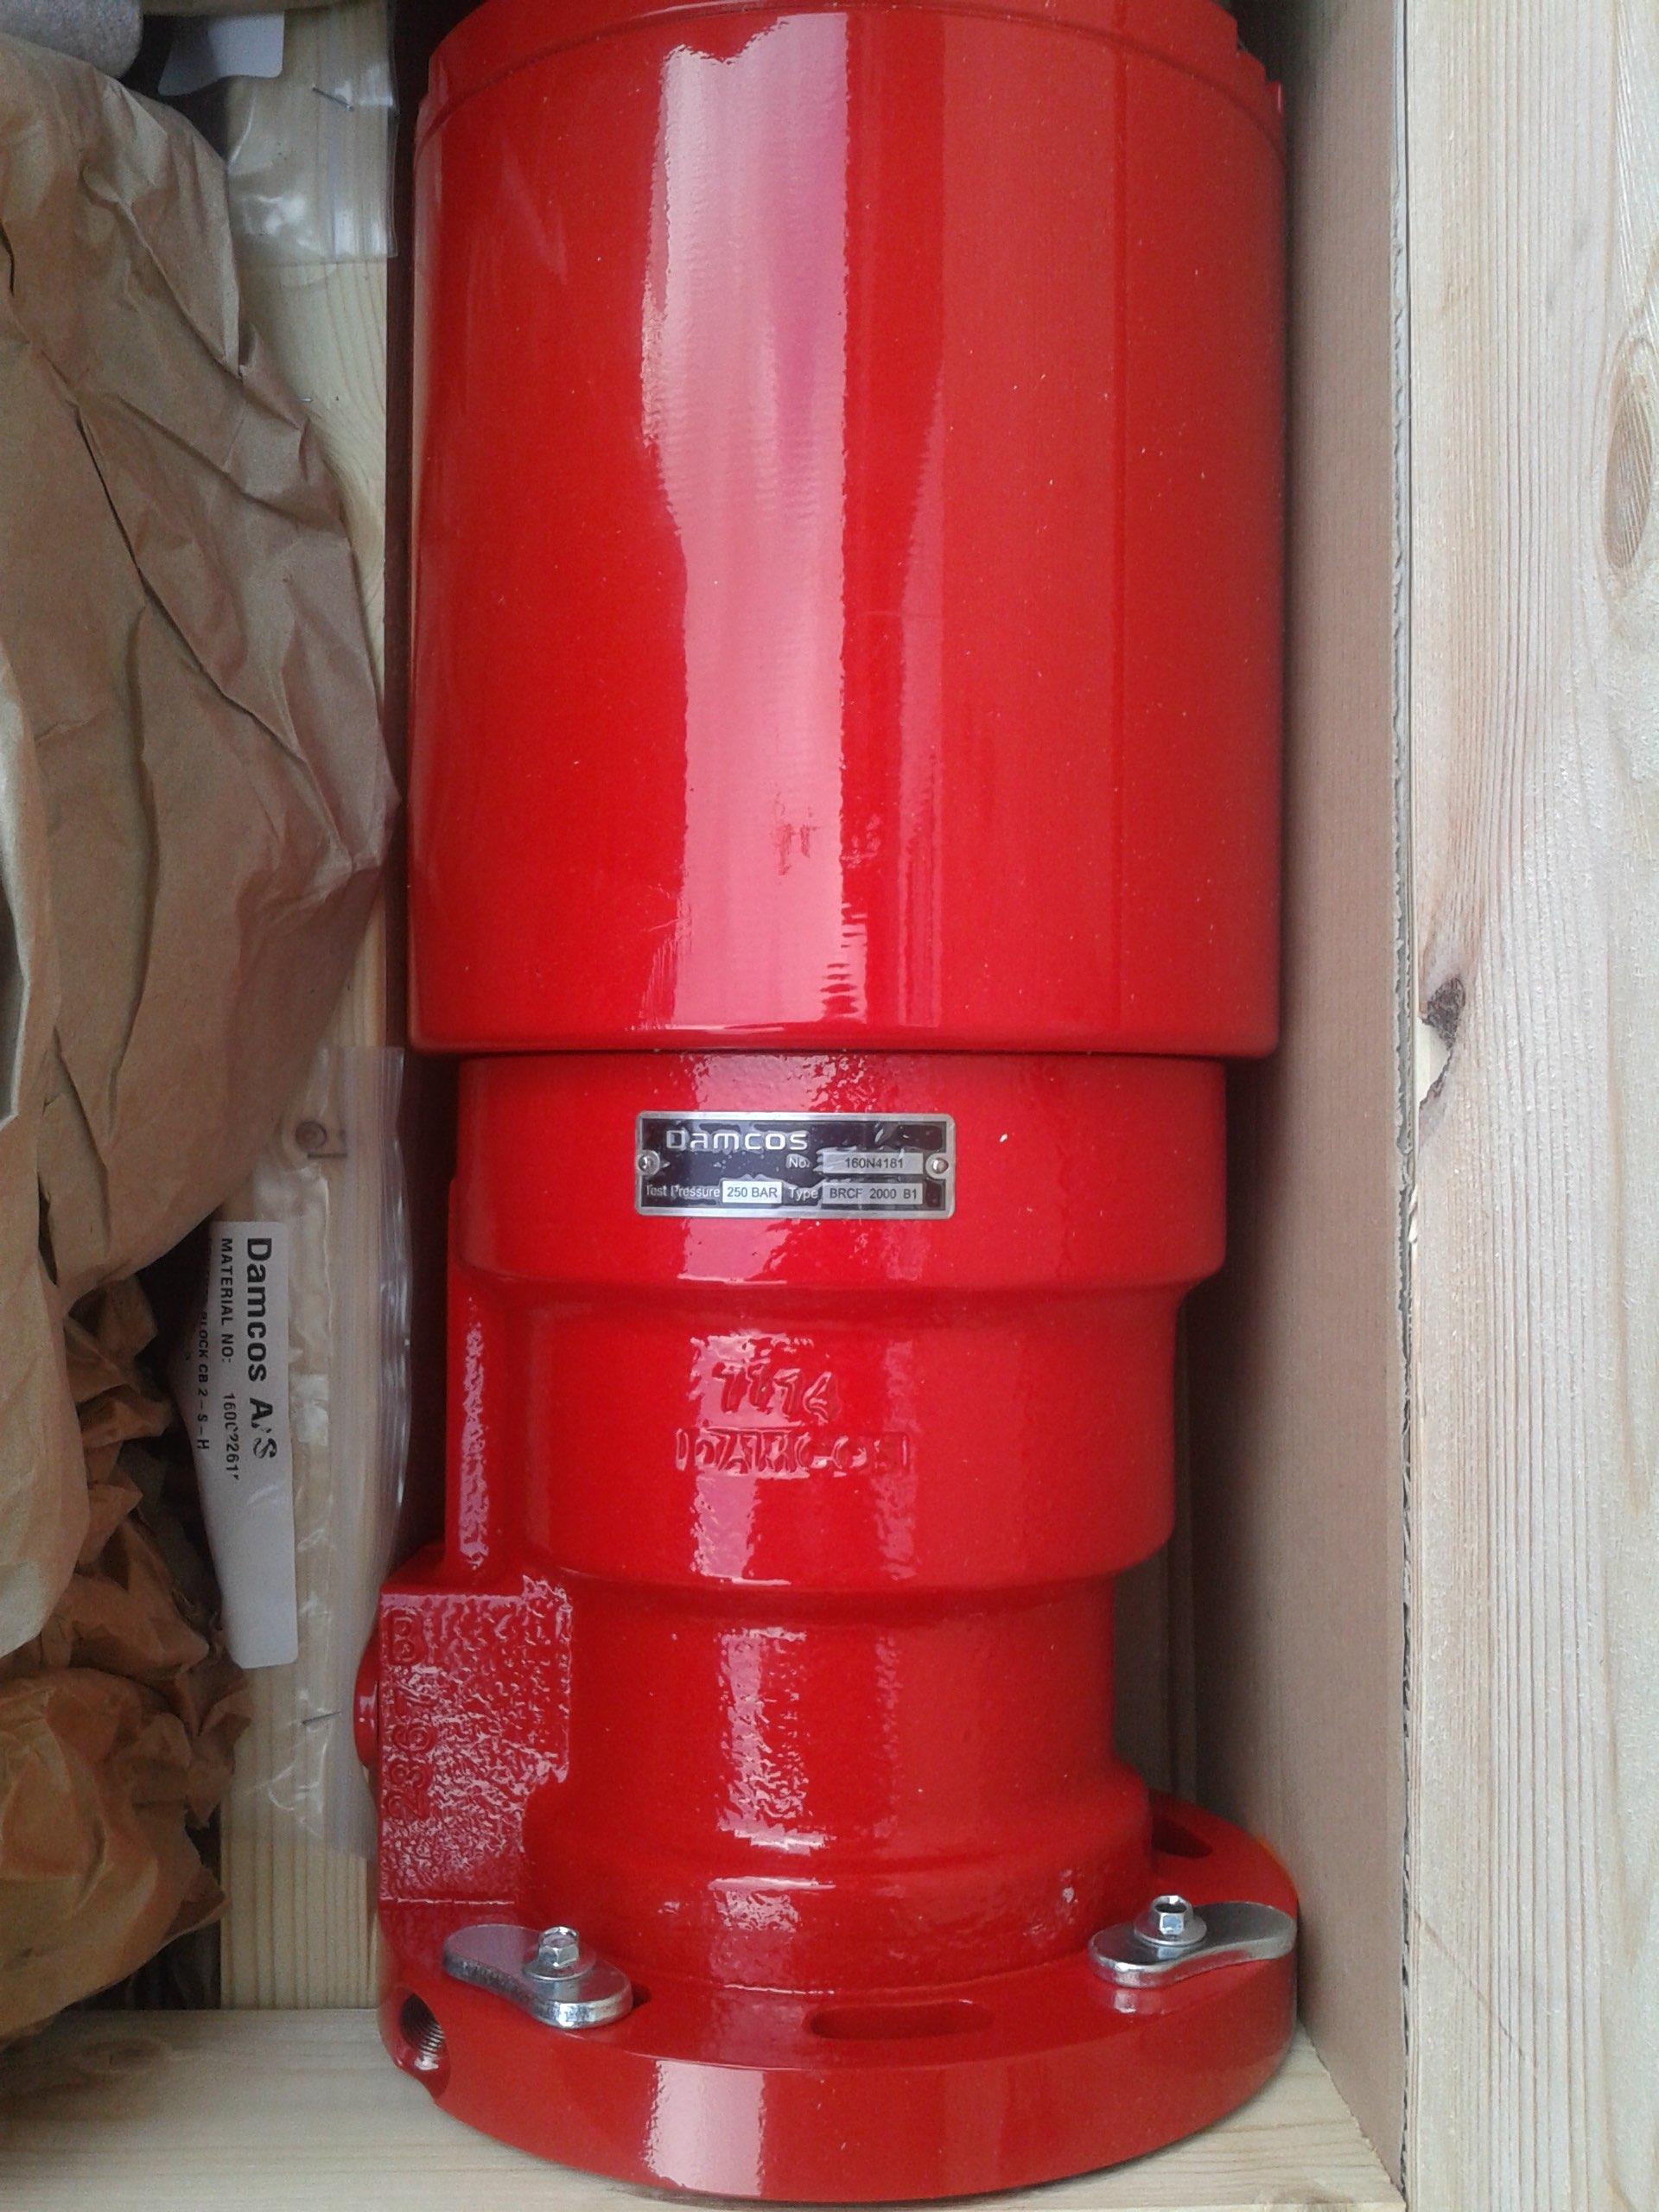 Damcos : Danfoss BRCF 2000 B1 Actuator 160N4181